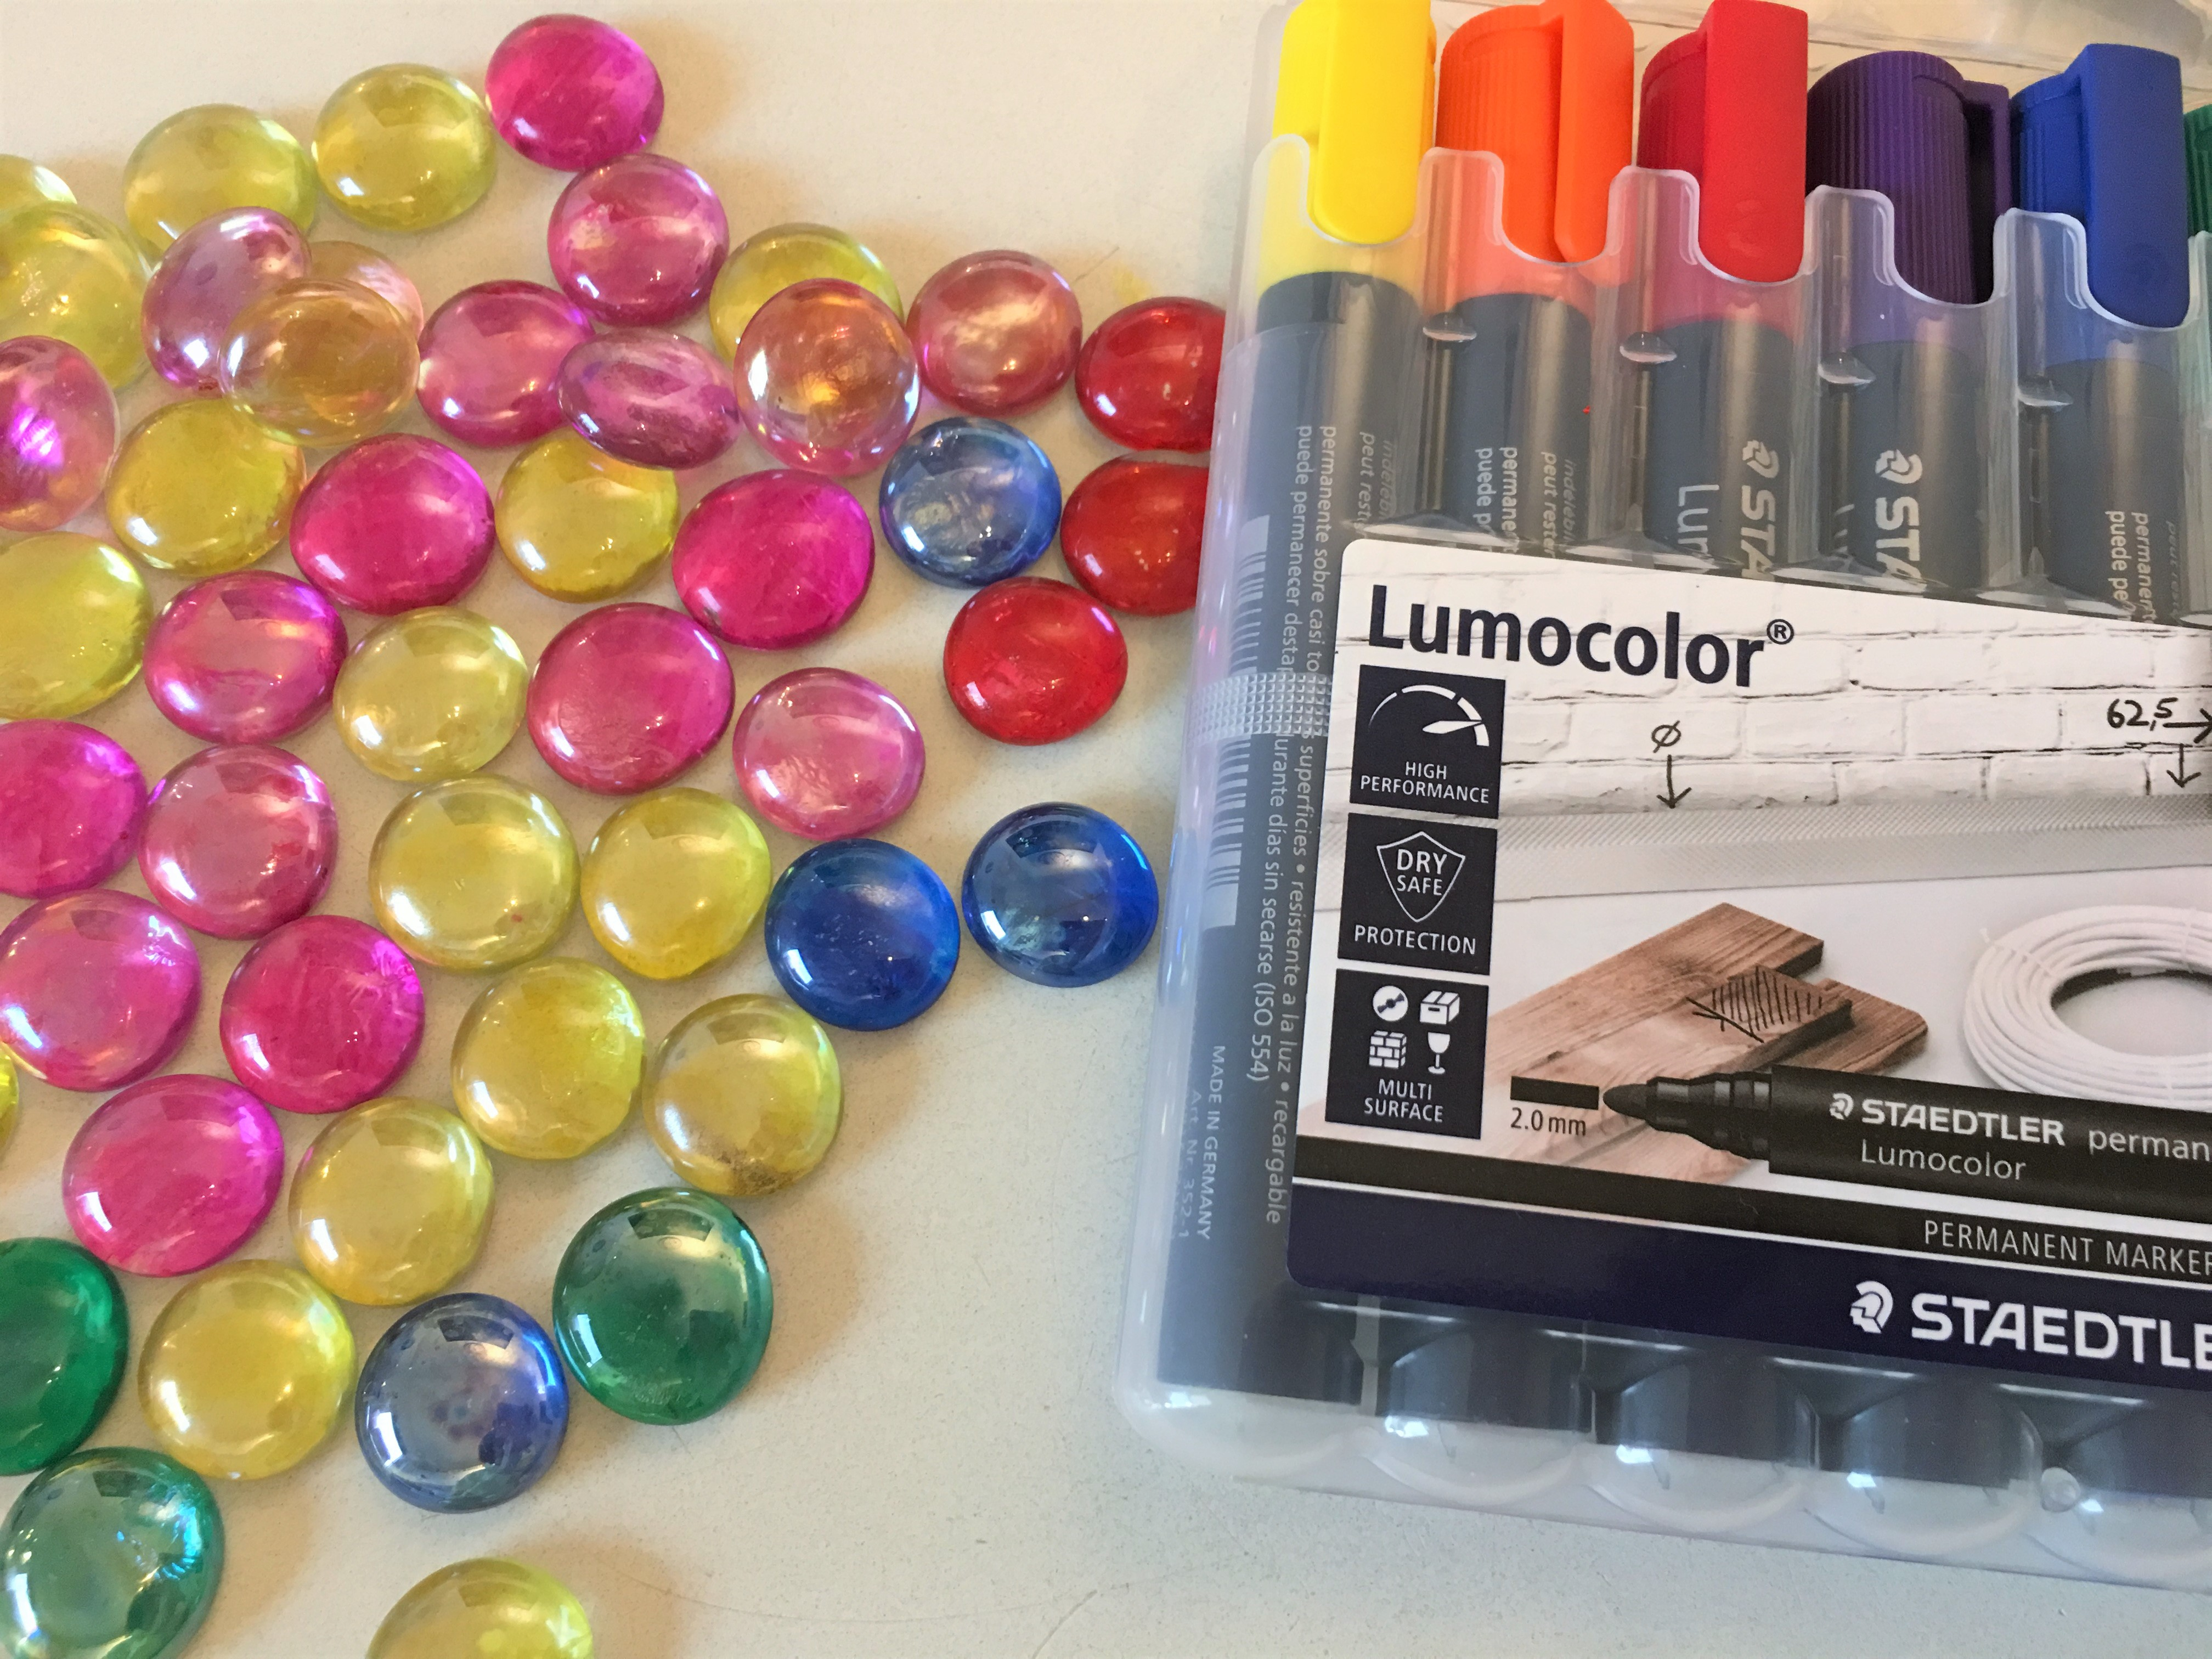 Lumocolor staedtler